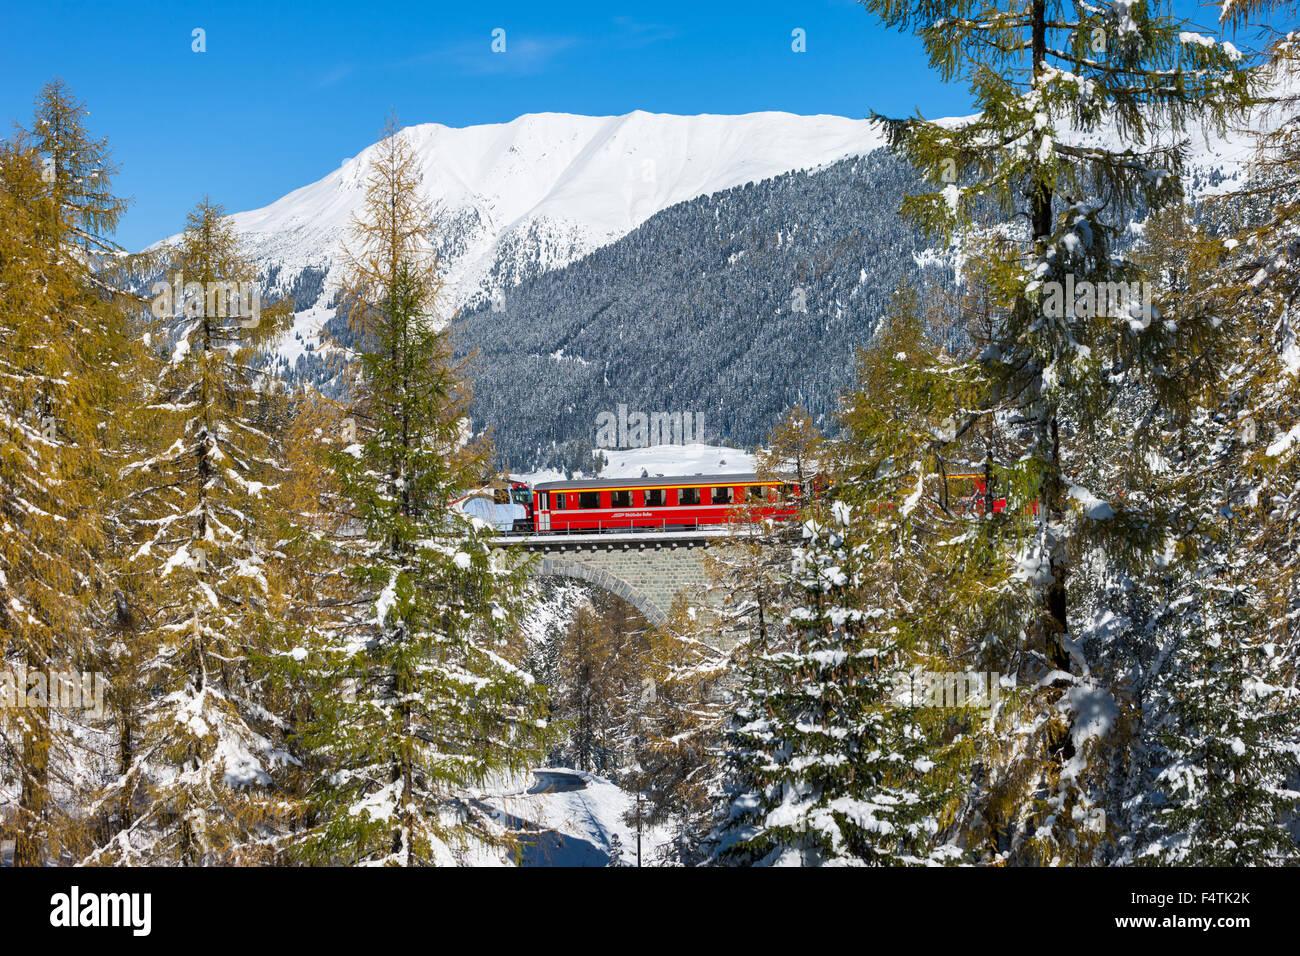 Ferrocarril Albula, Albula, ferrocarril, tren, Suiza, en el cantón de Grisones, Graubünden, UNESCO, patrimonio Imagen De Stock